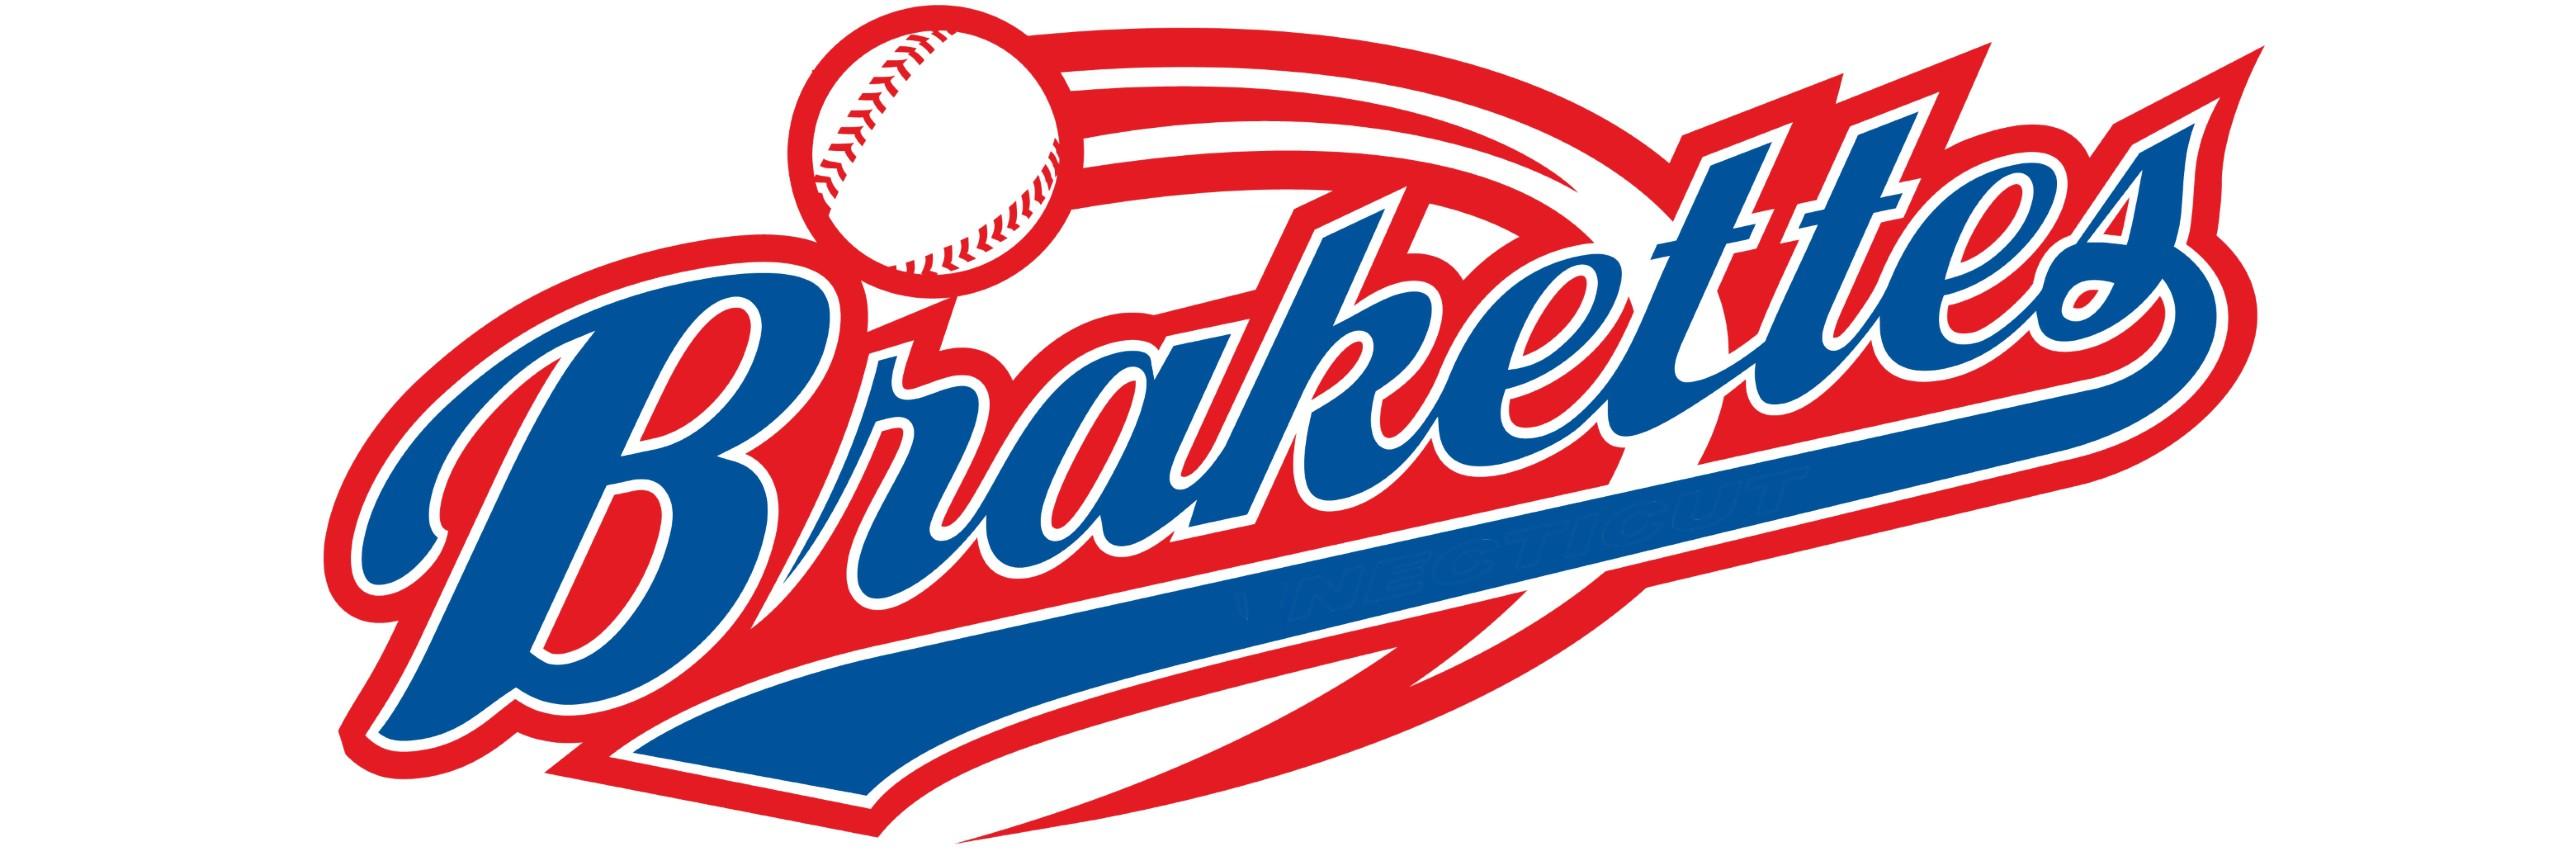 Brakettes Softball